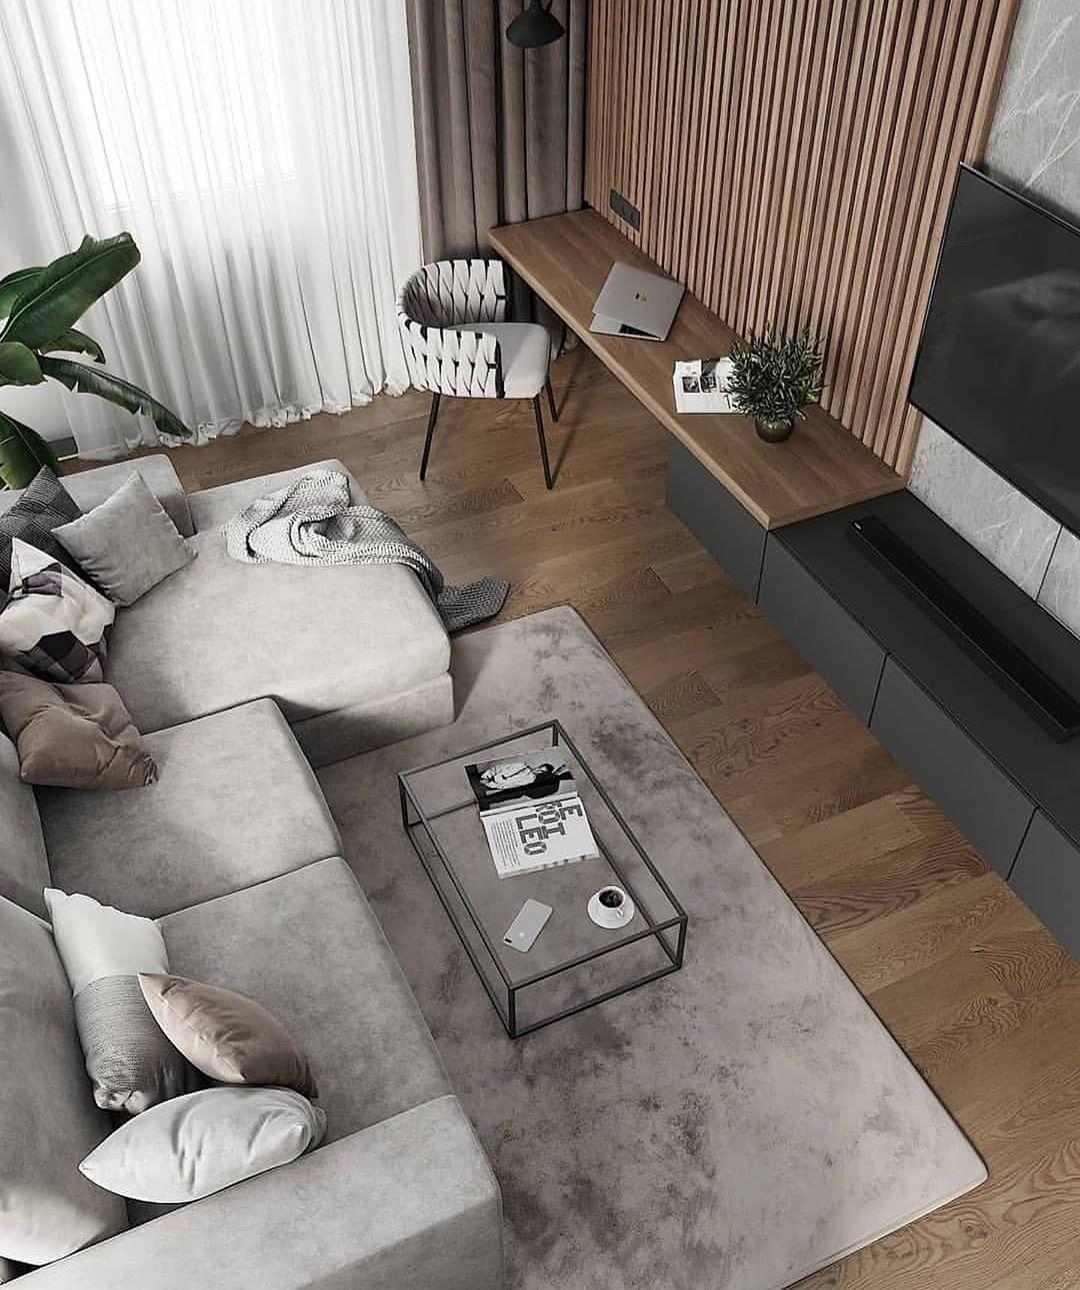 Lorena lima dicadalores on instagram projeto de casa for Casa minimalista lima